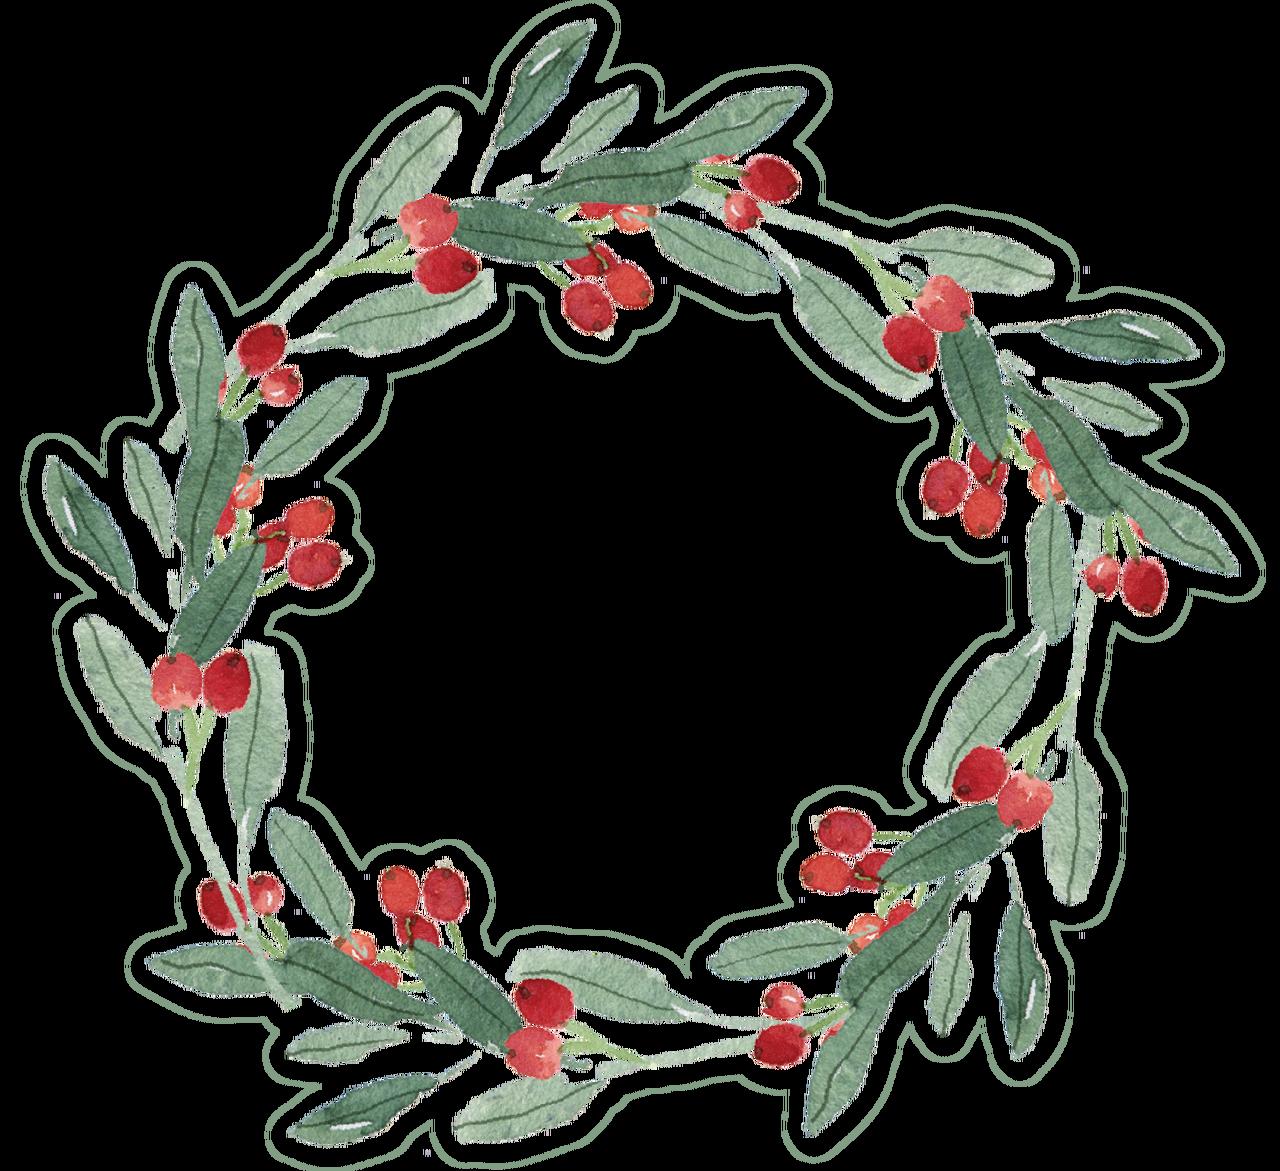 - Christmas Wreath #2 Print & Cut File - Snap Click Supply Co.